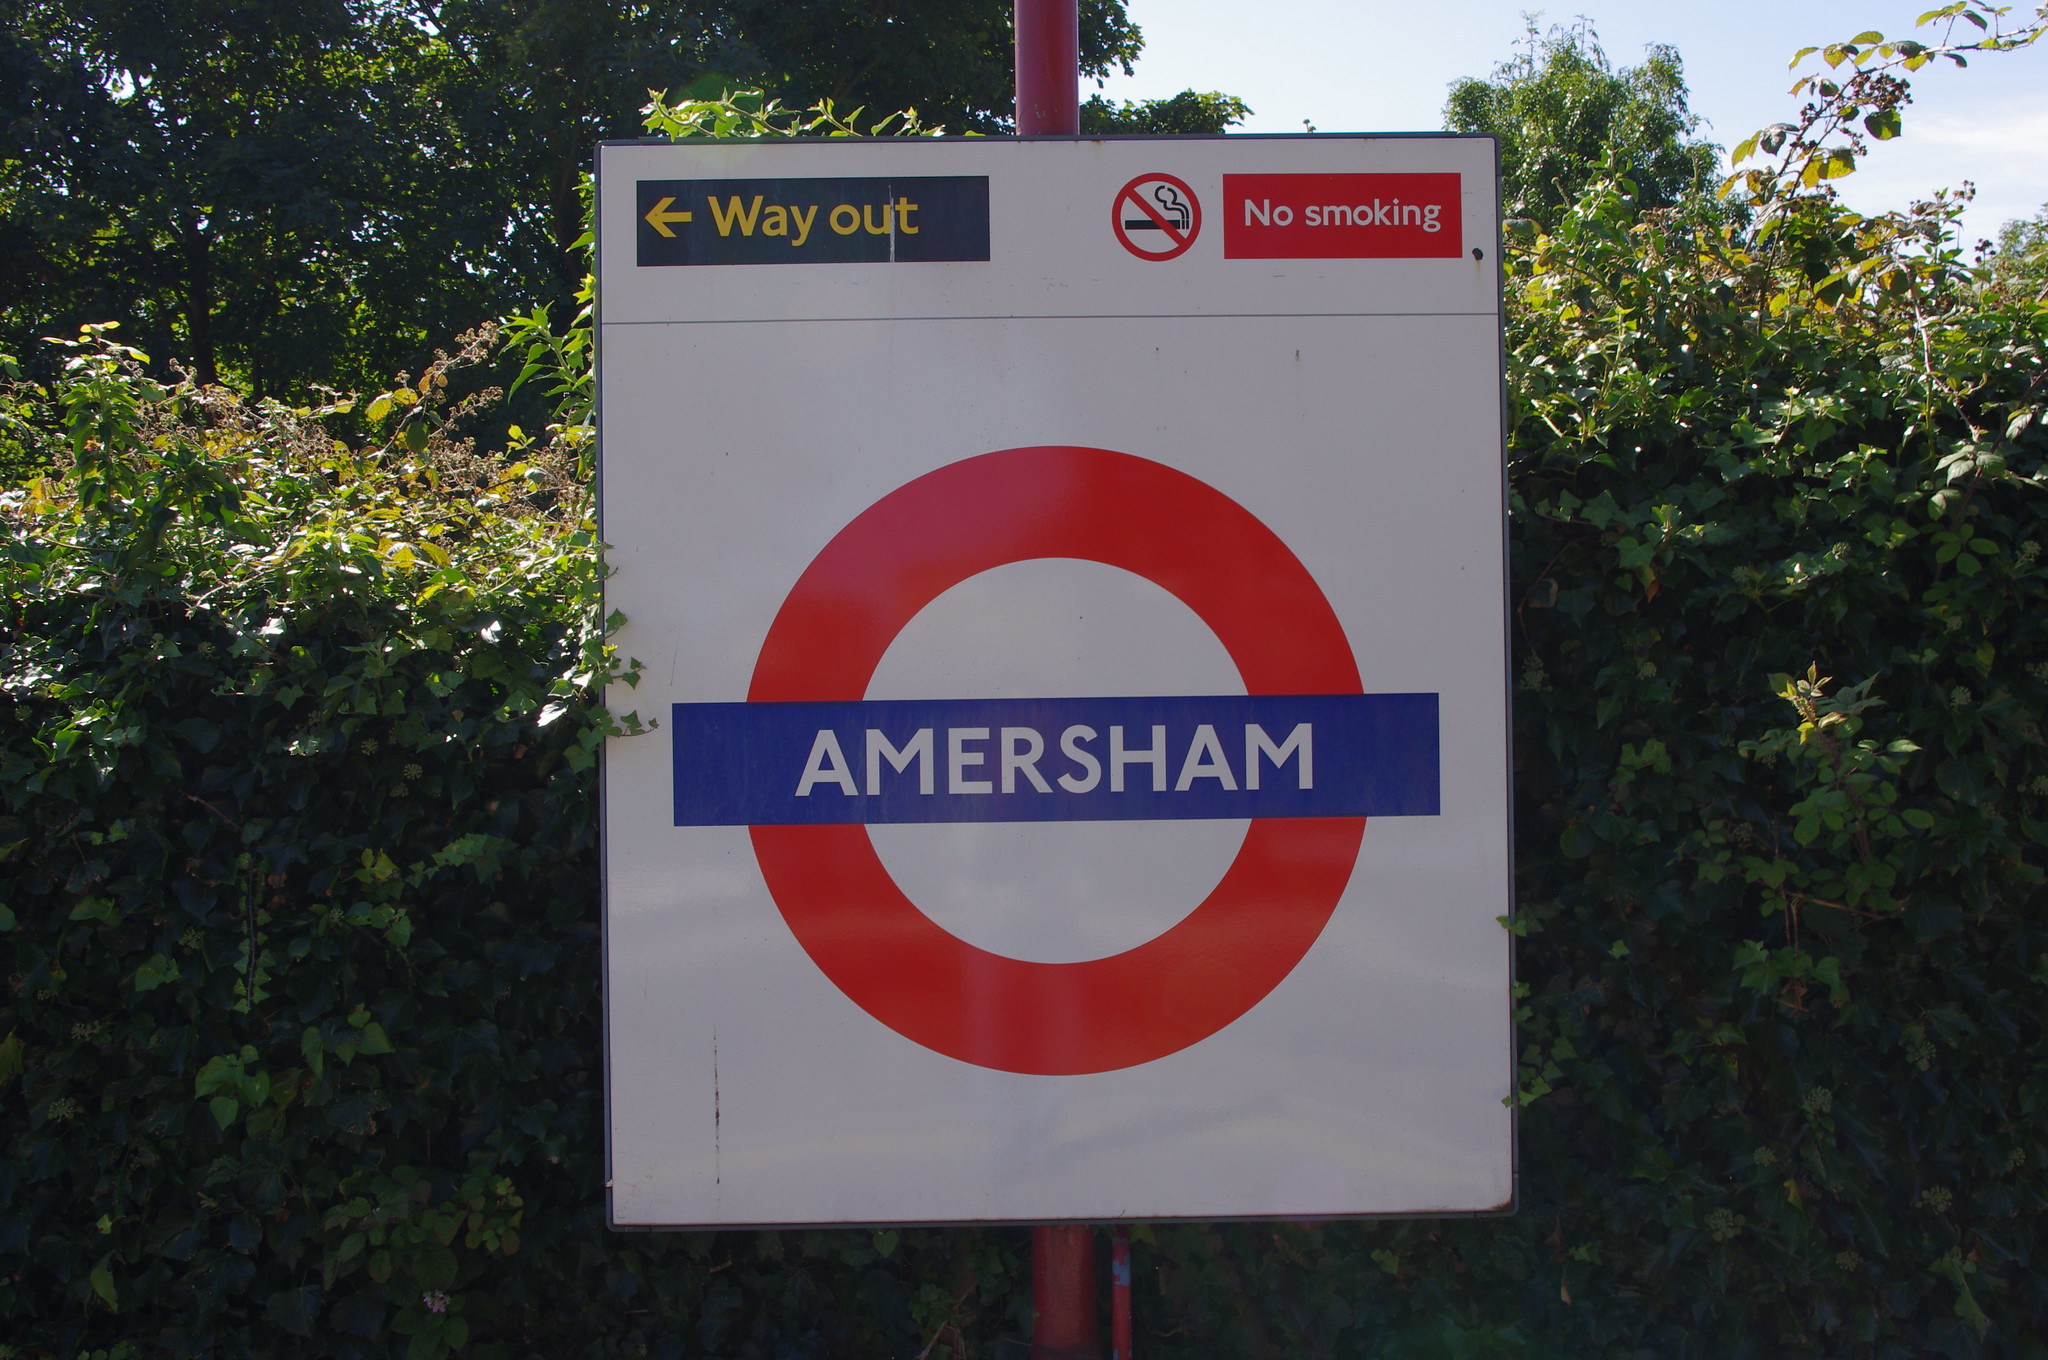 Speed dating amersham